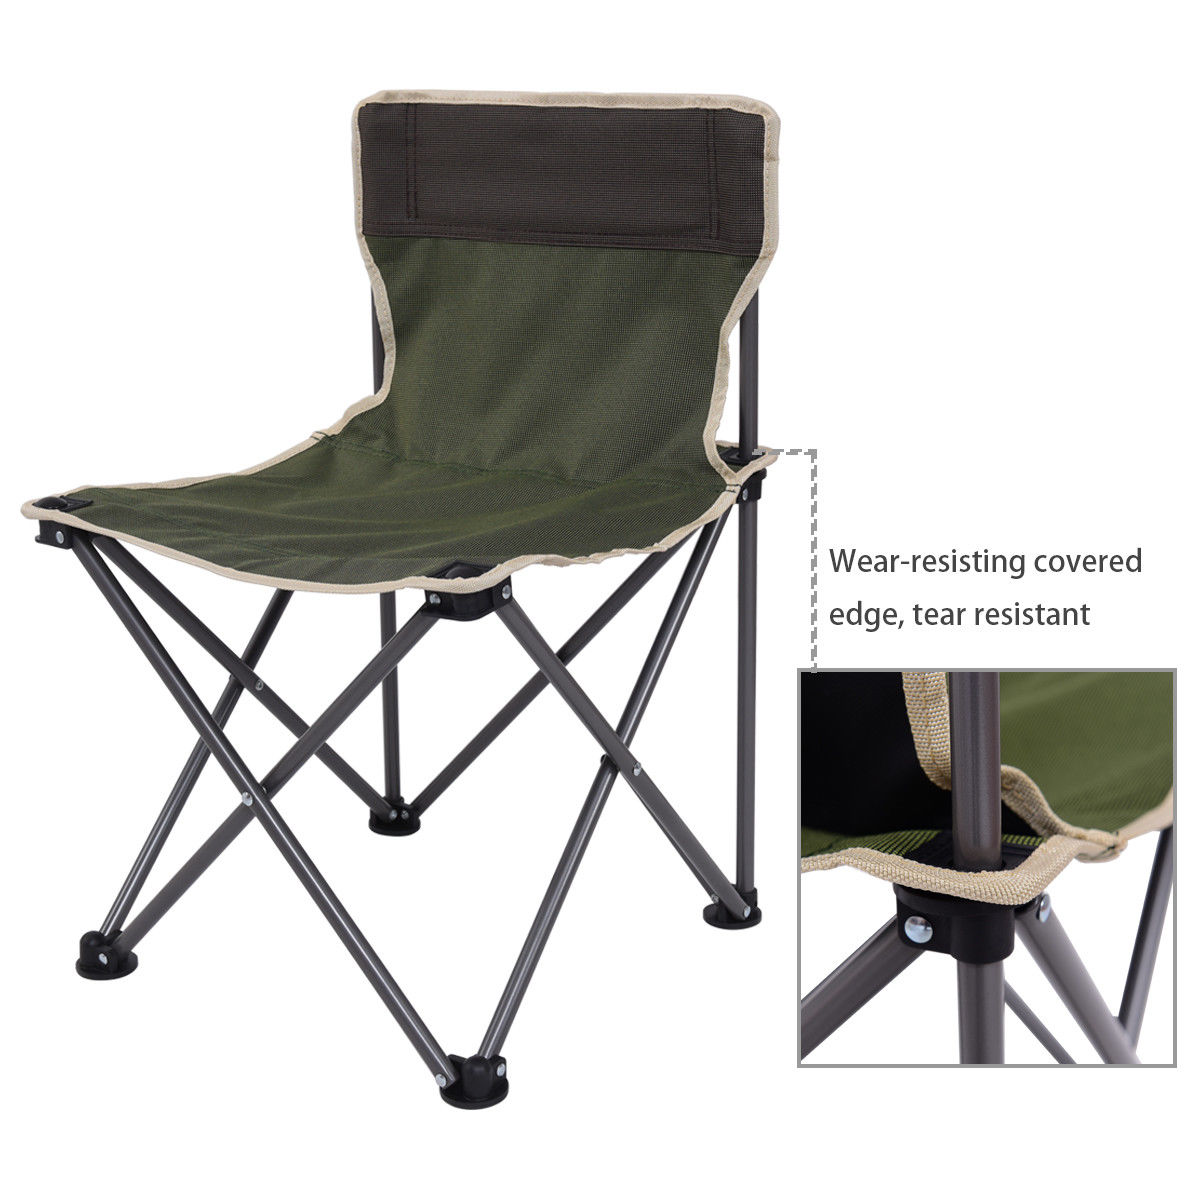 Giantex Portable Outdoor Folding Table Chairs Set Camping Beach ...